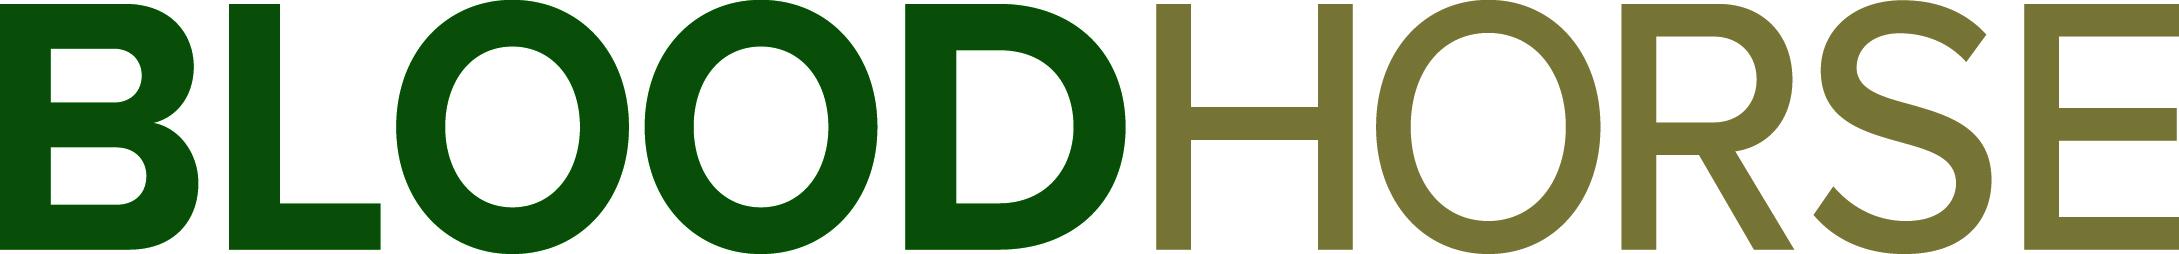 BH-logo_green_gold_cmyk.jpg